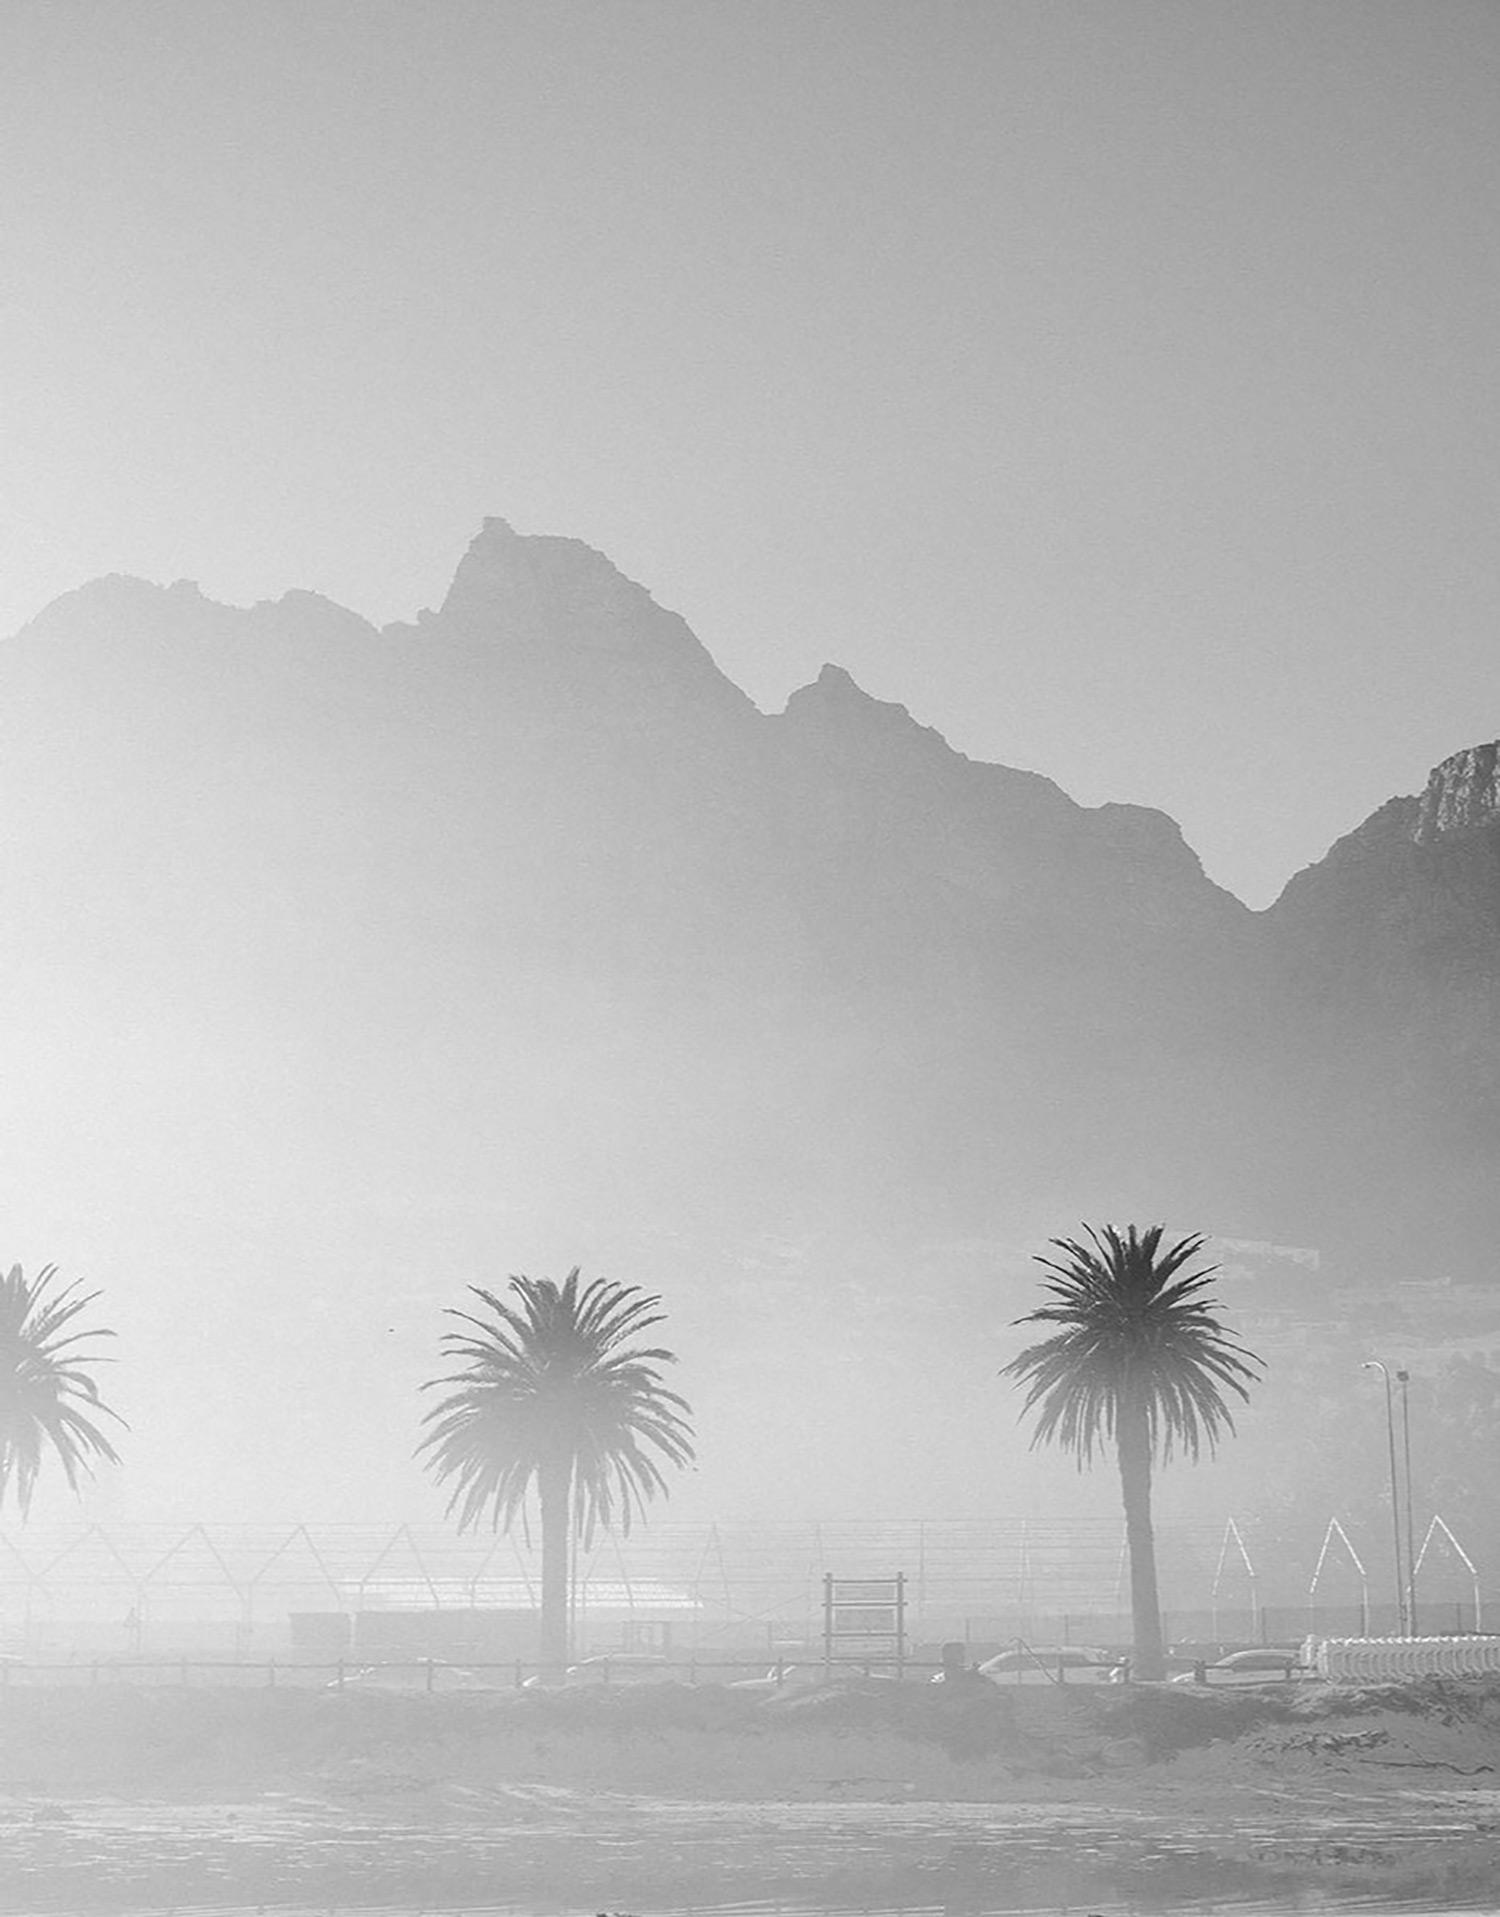 2-beach-palm-trees-in-the-mist.jpg